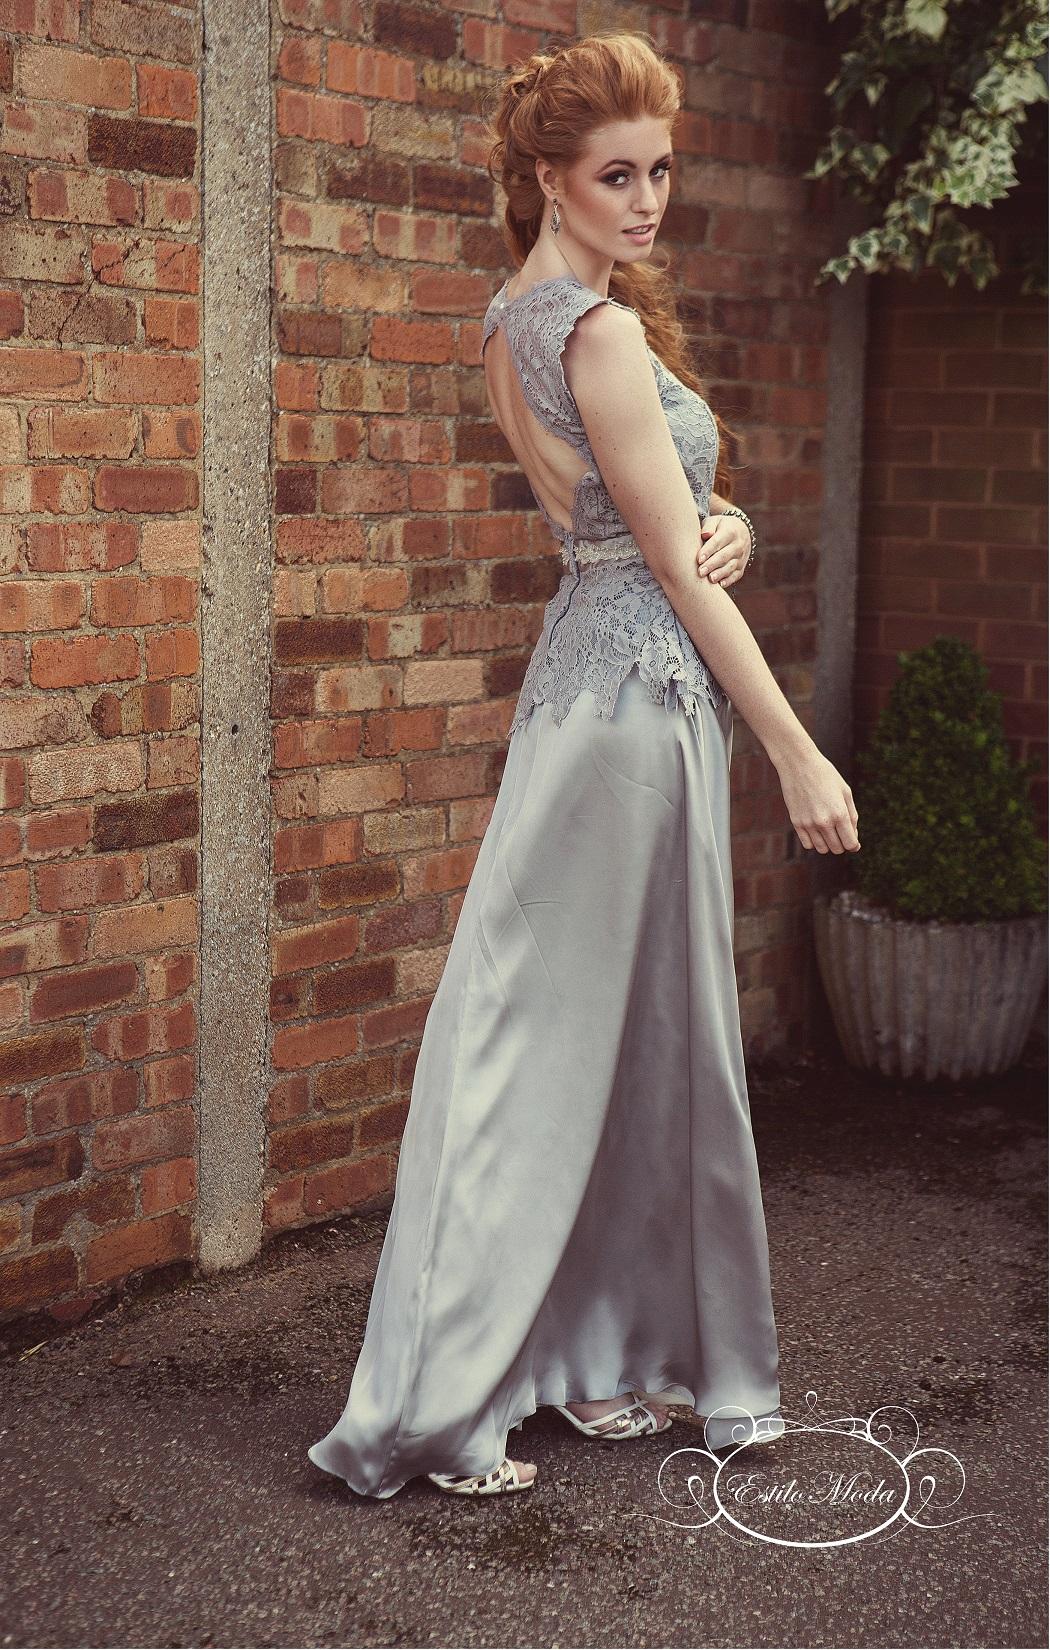 Estilo Moda Bridal prom dress shop in milton keynes Lace and silk keyhole back cap sleeve A-line skirt prom dress. Lace A-line evening dress